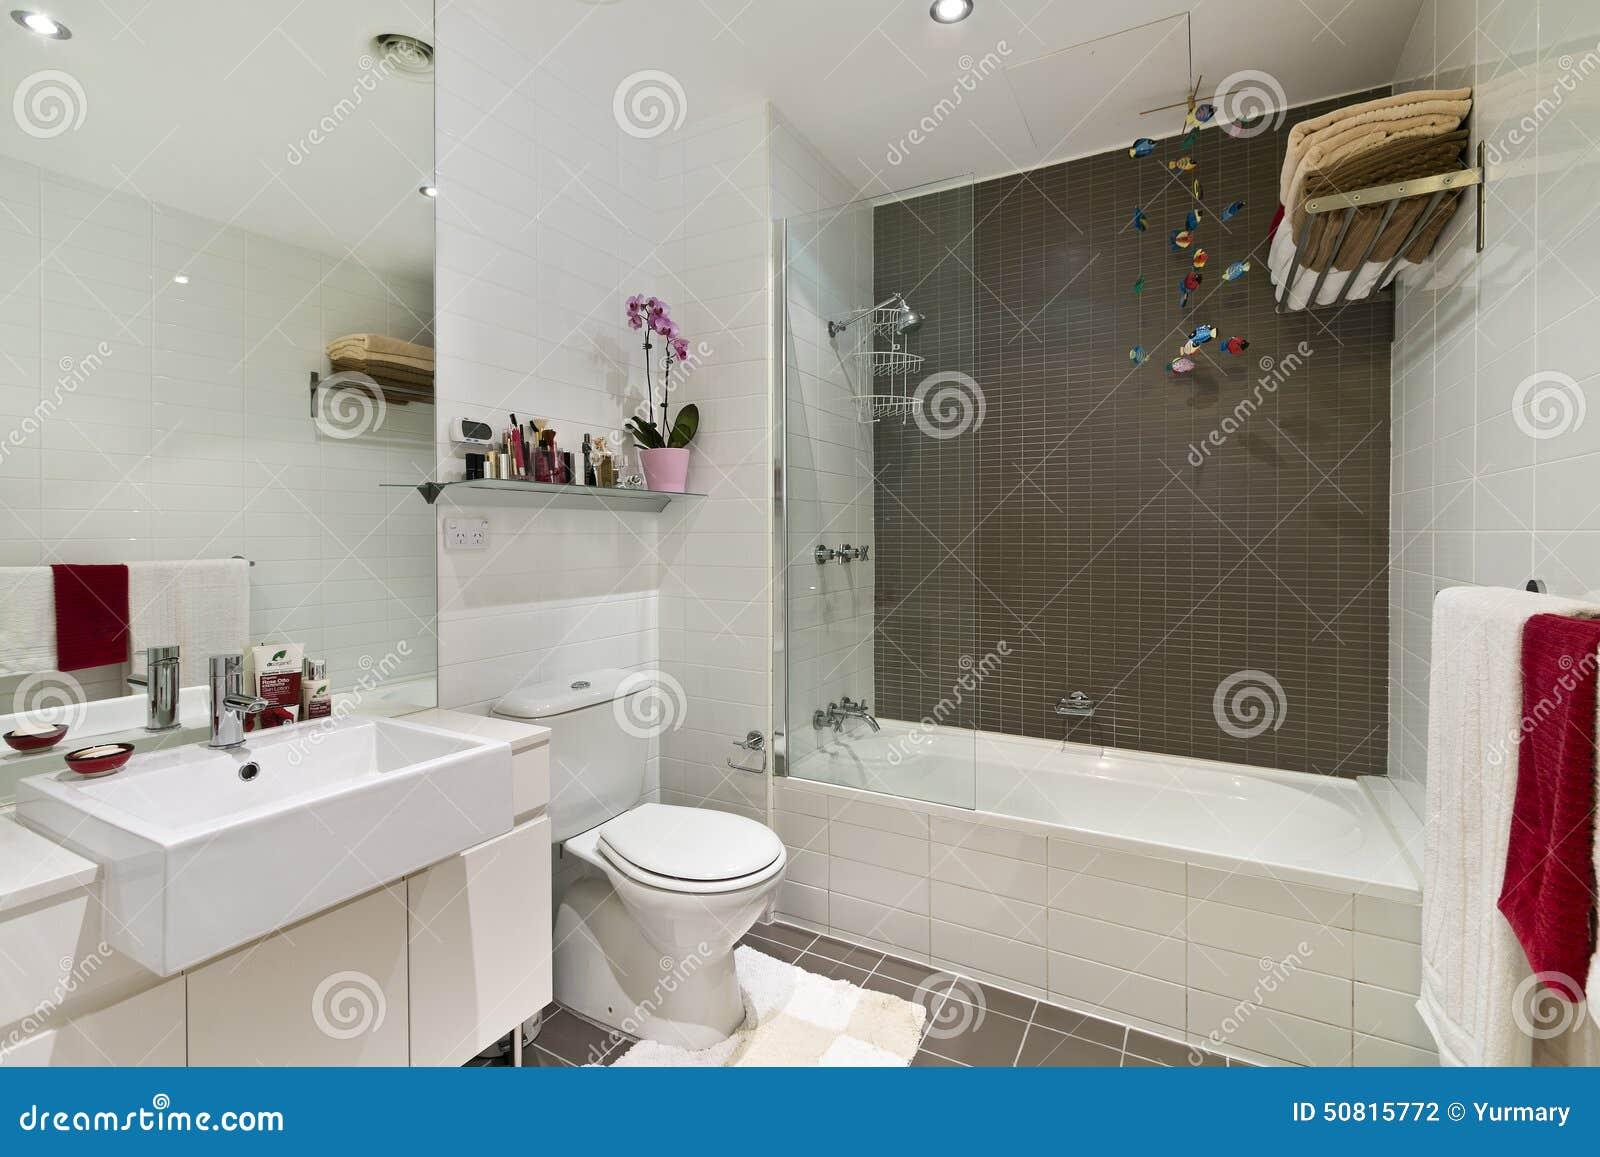 Salle de bains moderne en appartement de luxe photo stock for Salle de bain de luxe moderne